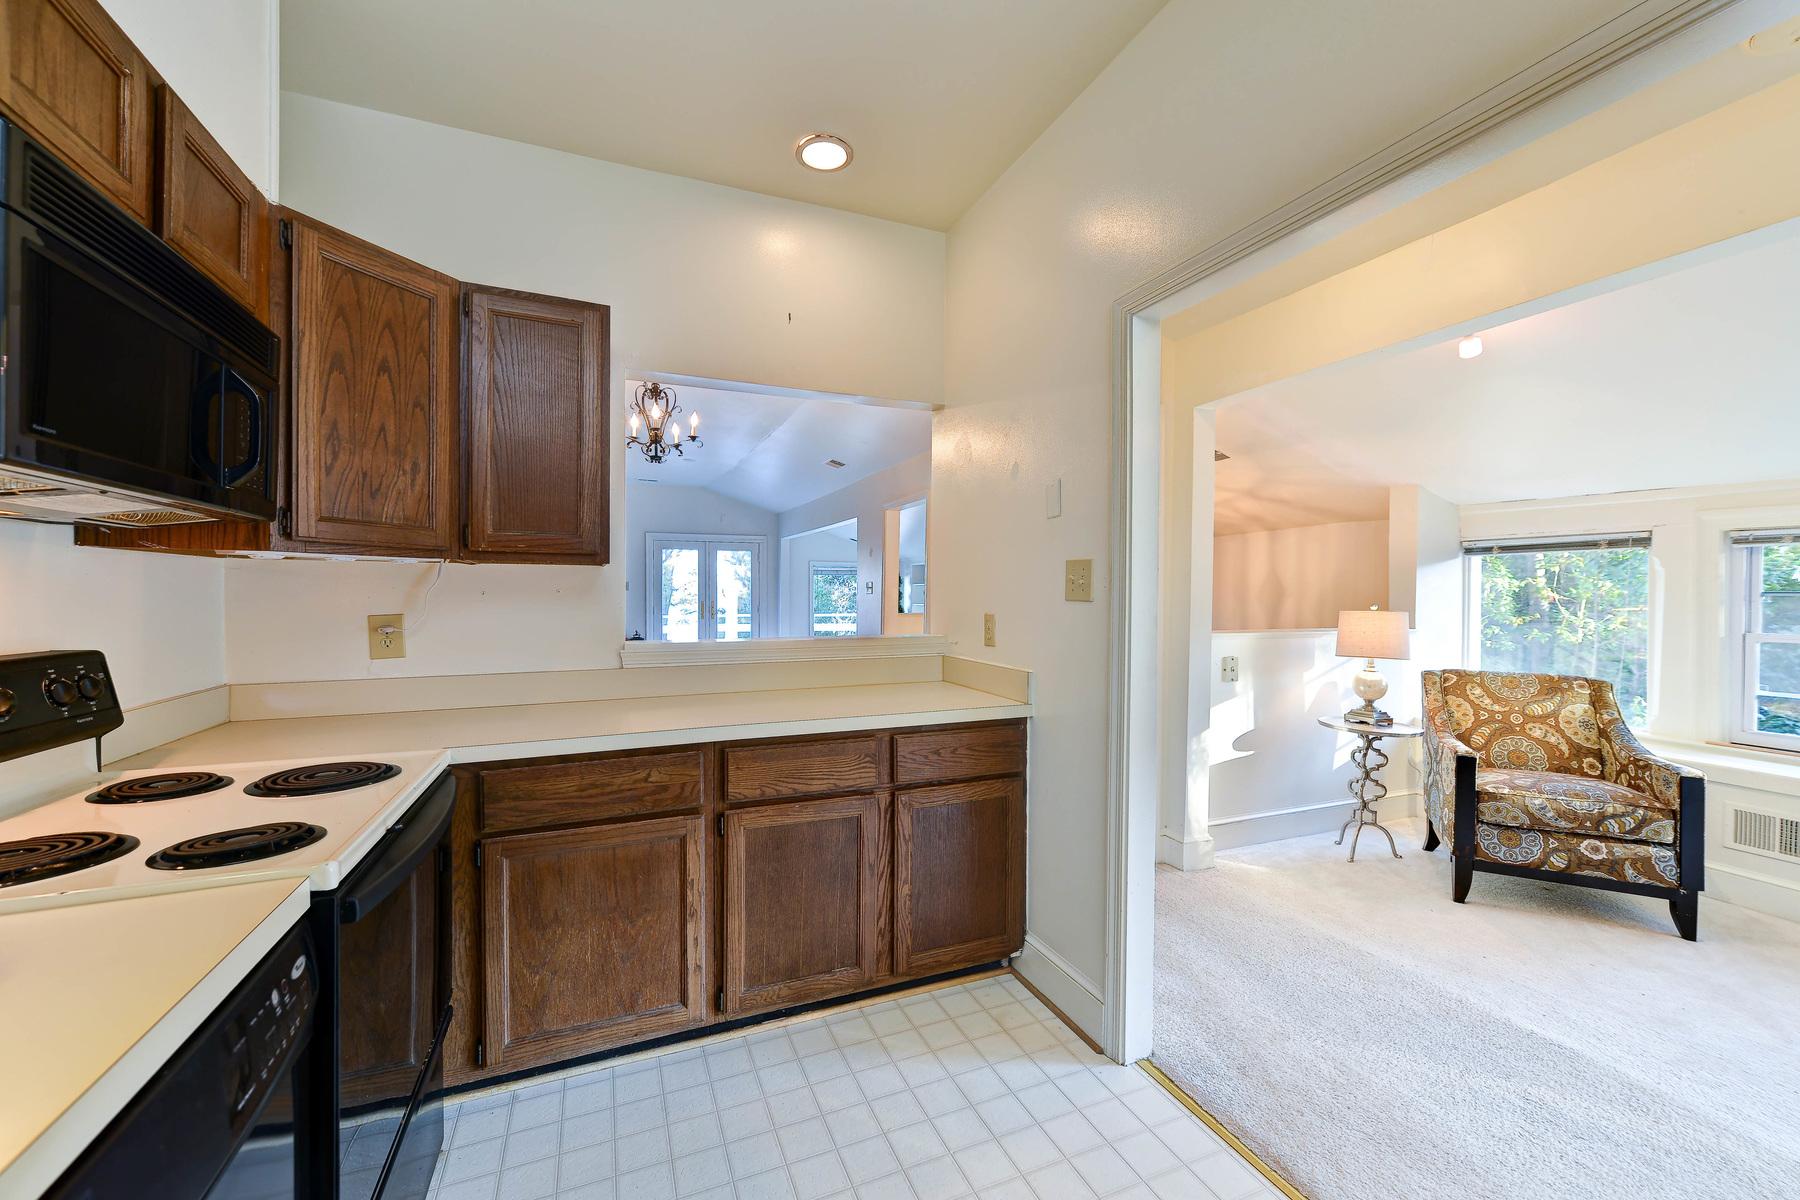 Additional photo for property listing at 883 Andalusia Drive, Alexandria  Alexandria, Virginia 22308 Estados Unidos